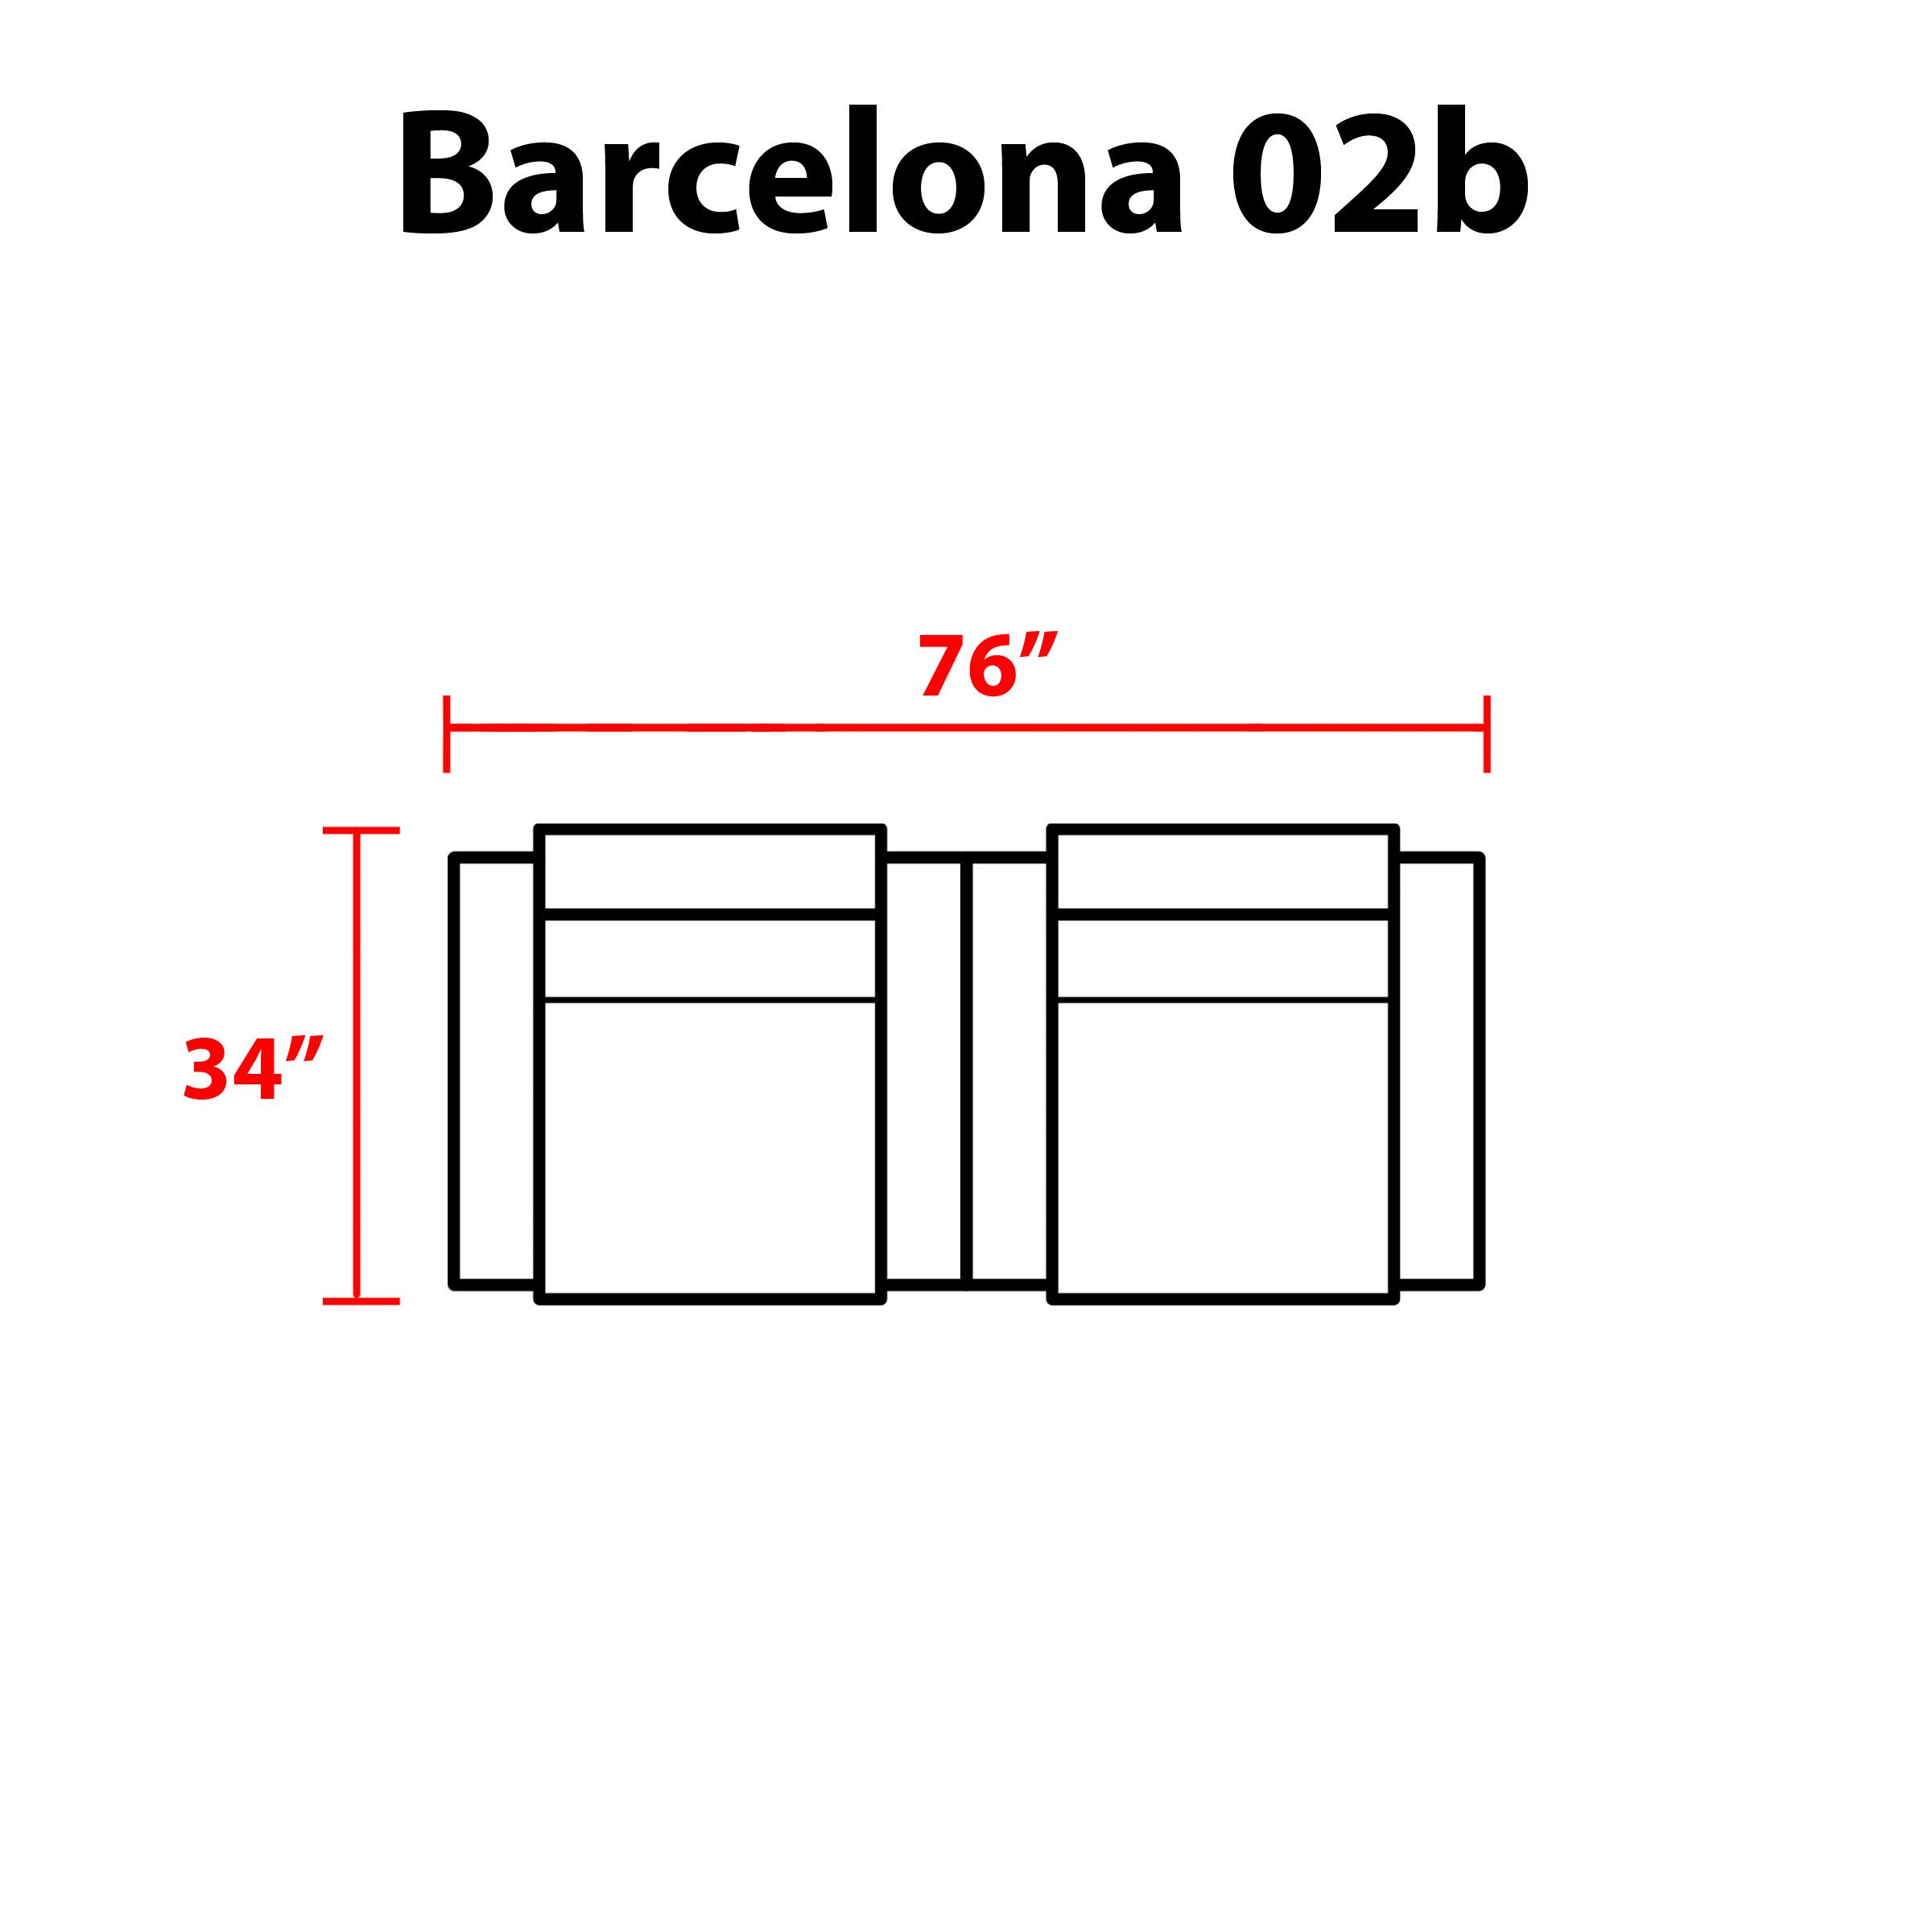 Barcelona 2 Piece Outdoor Wicker Patio Furniture Set 02b - TK Classics